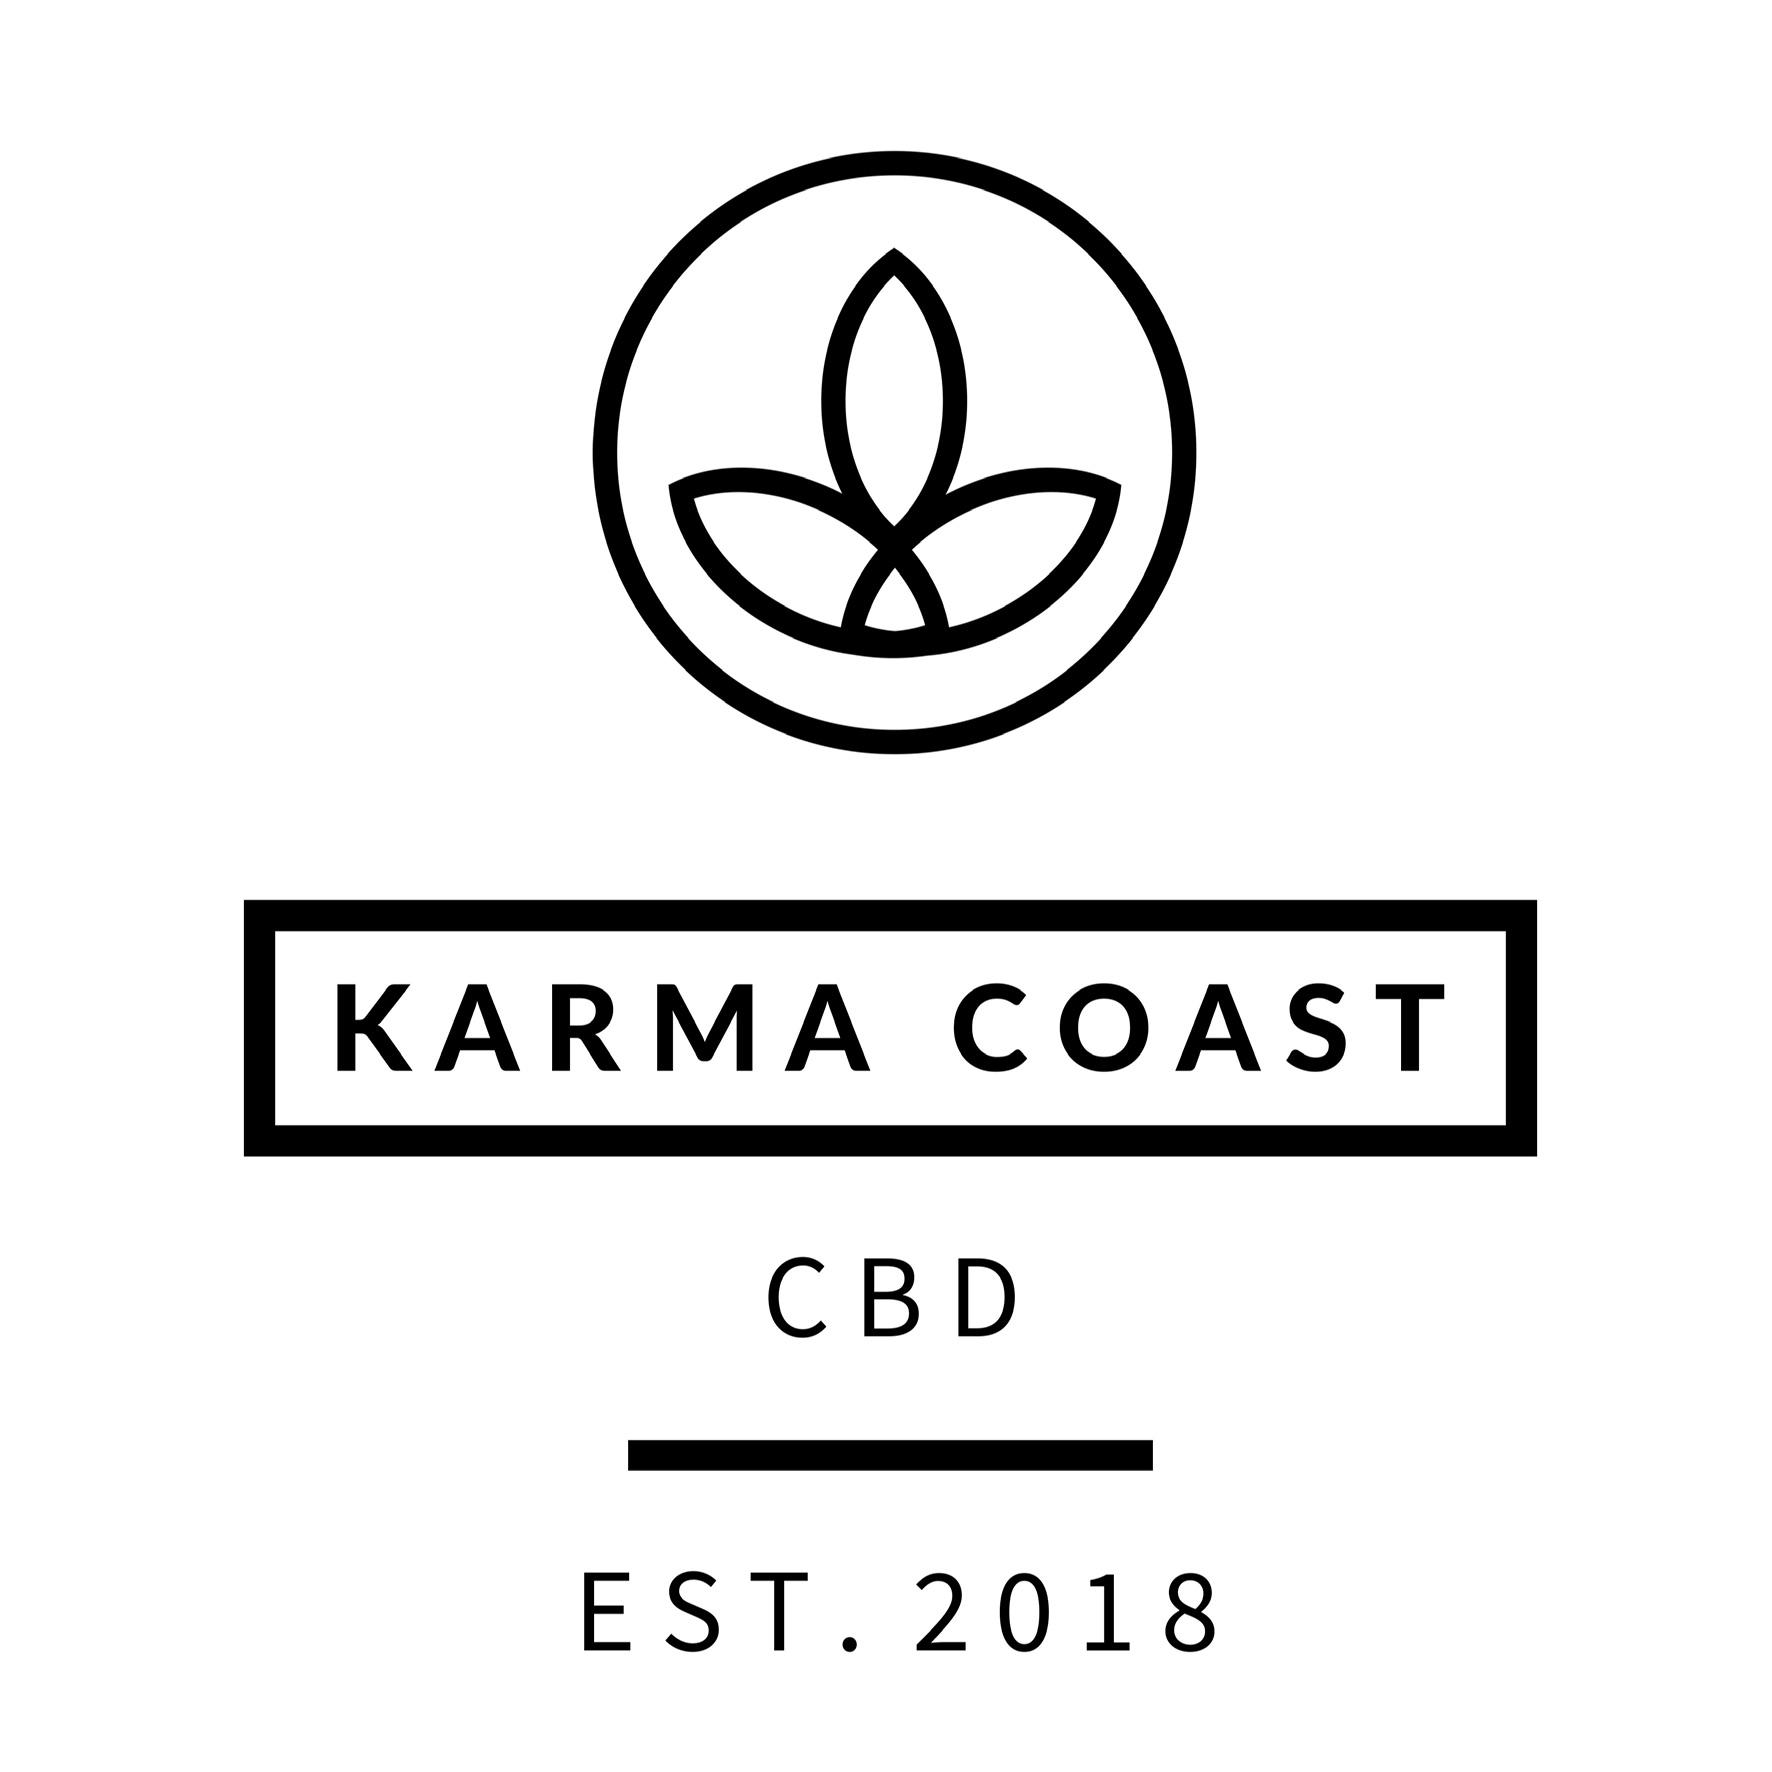 Karma Coast Image